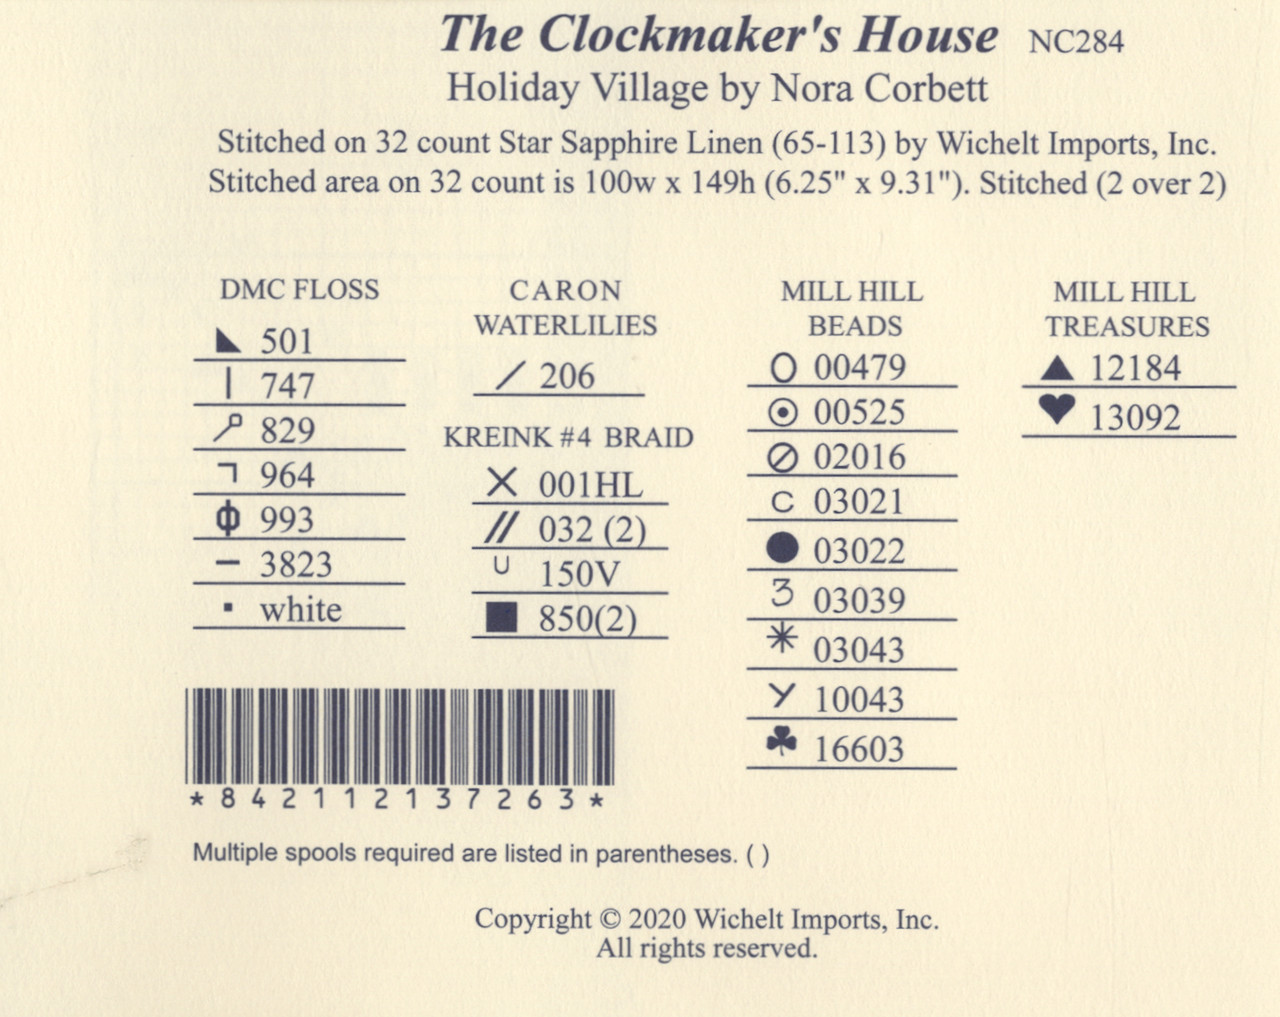 Nora Corbett - The Clockmaker's House